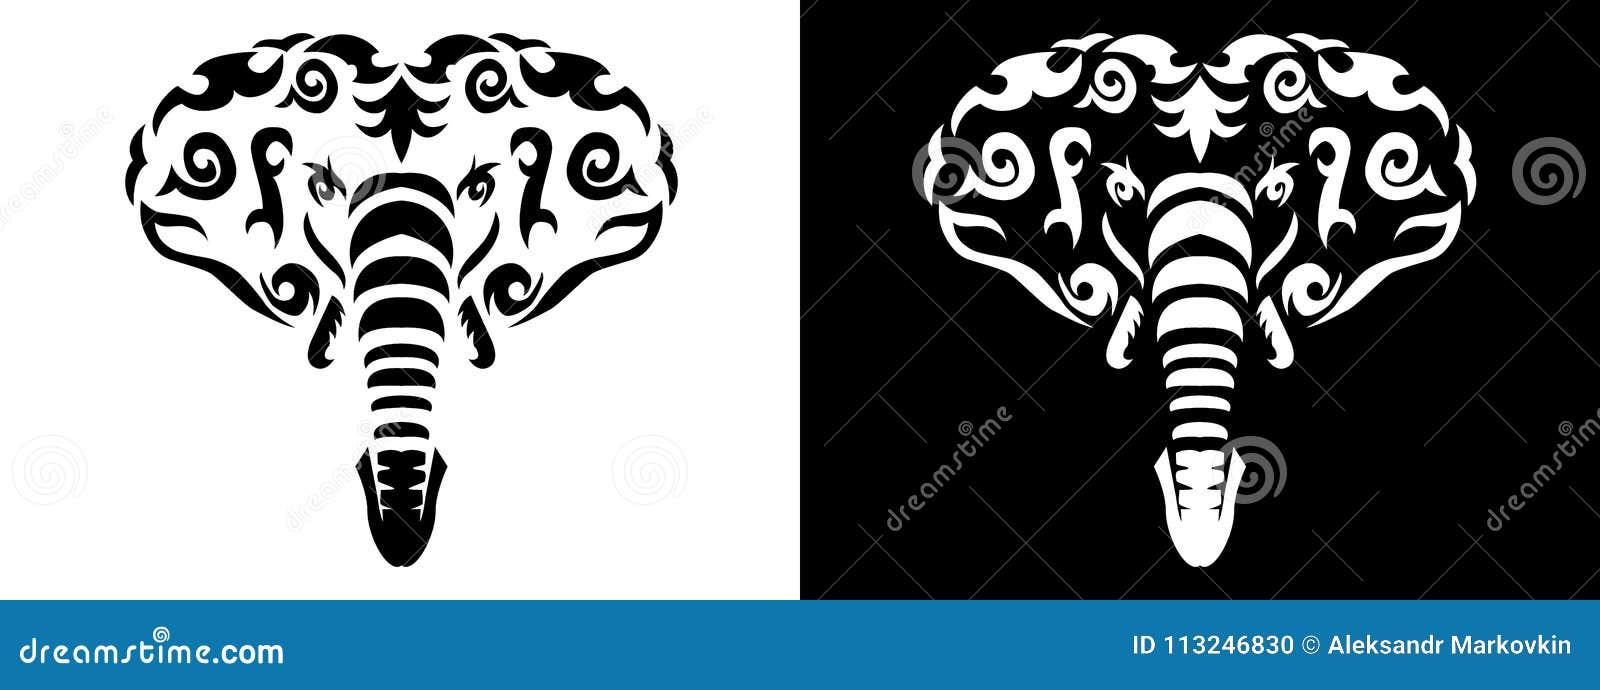 fc5ac36d975dc Tribal elephant set illustration, african elephant in tribal style,  ornamental white line elephant. Animal tattoo silhouette.